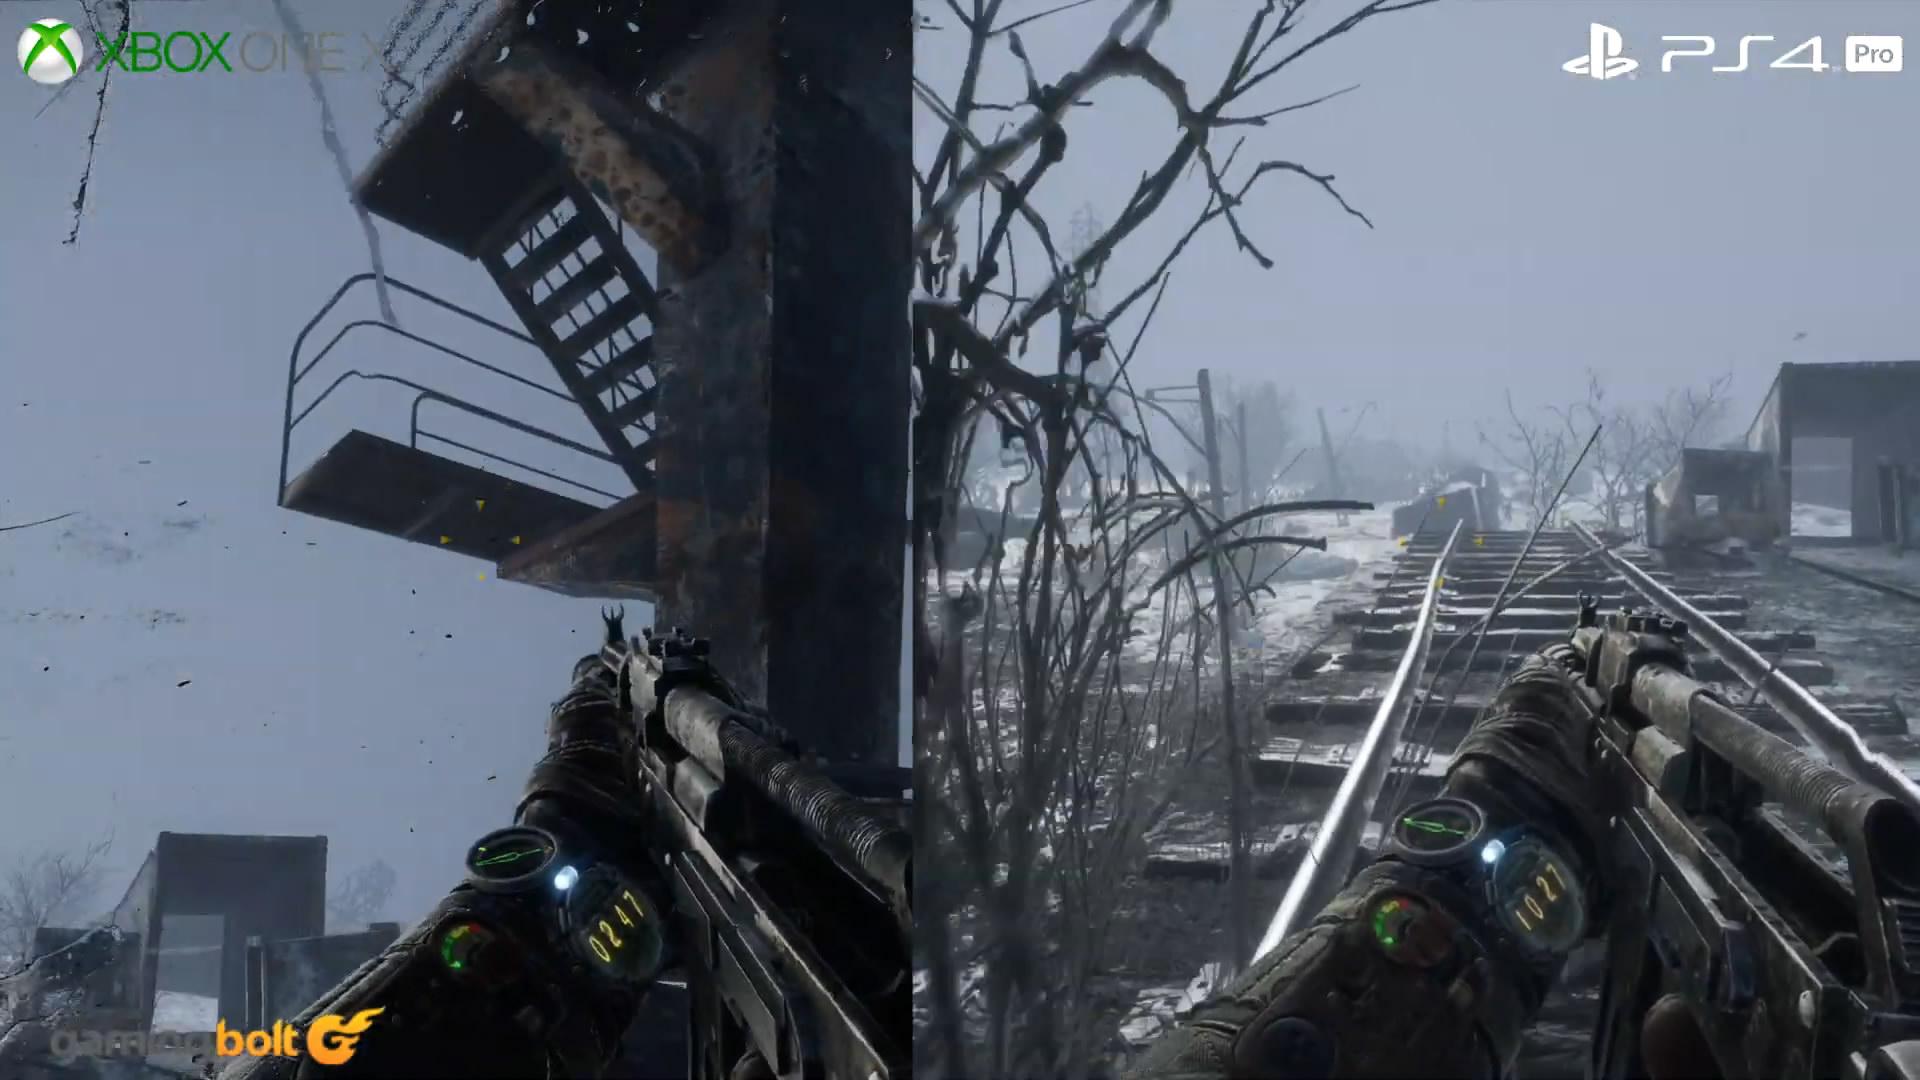 《地铁:逃离》PC/PS4 Pro/X1X对比 PC版画面最棒